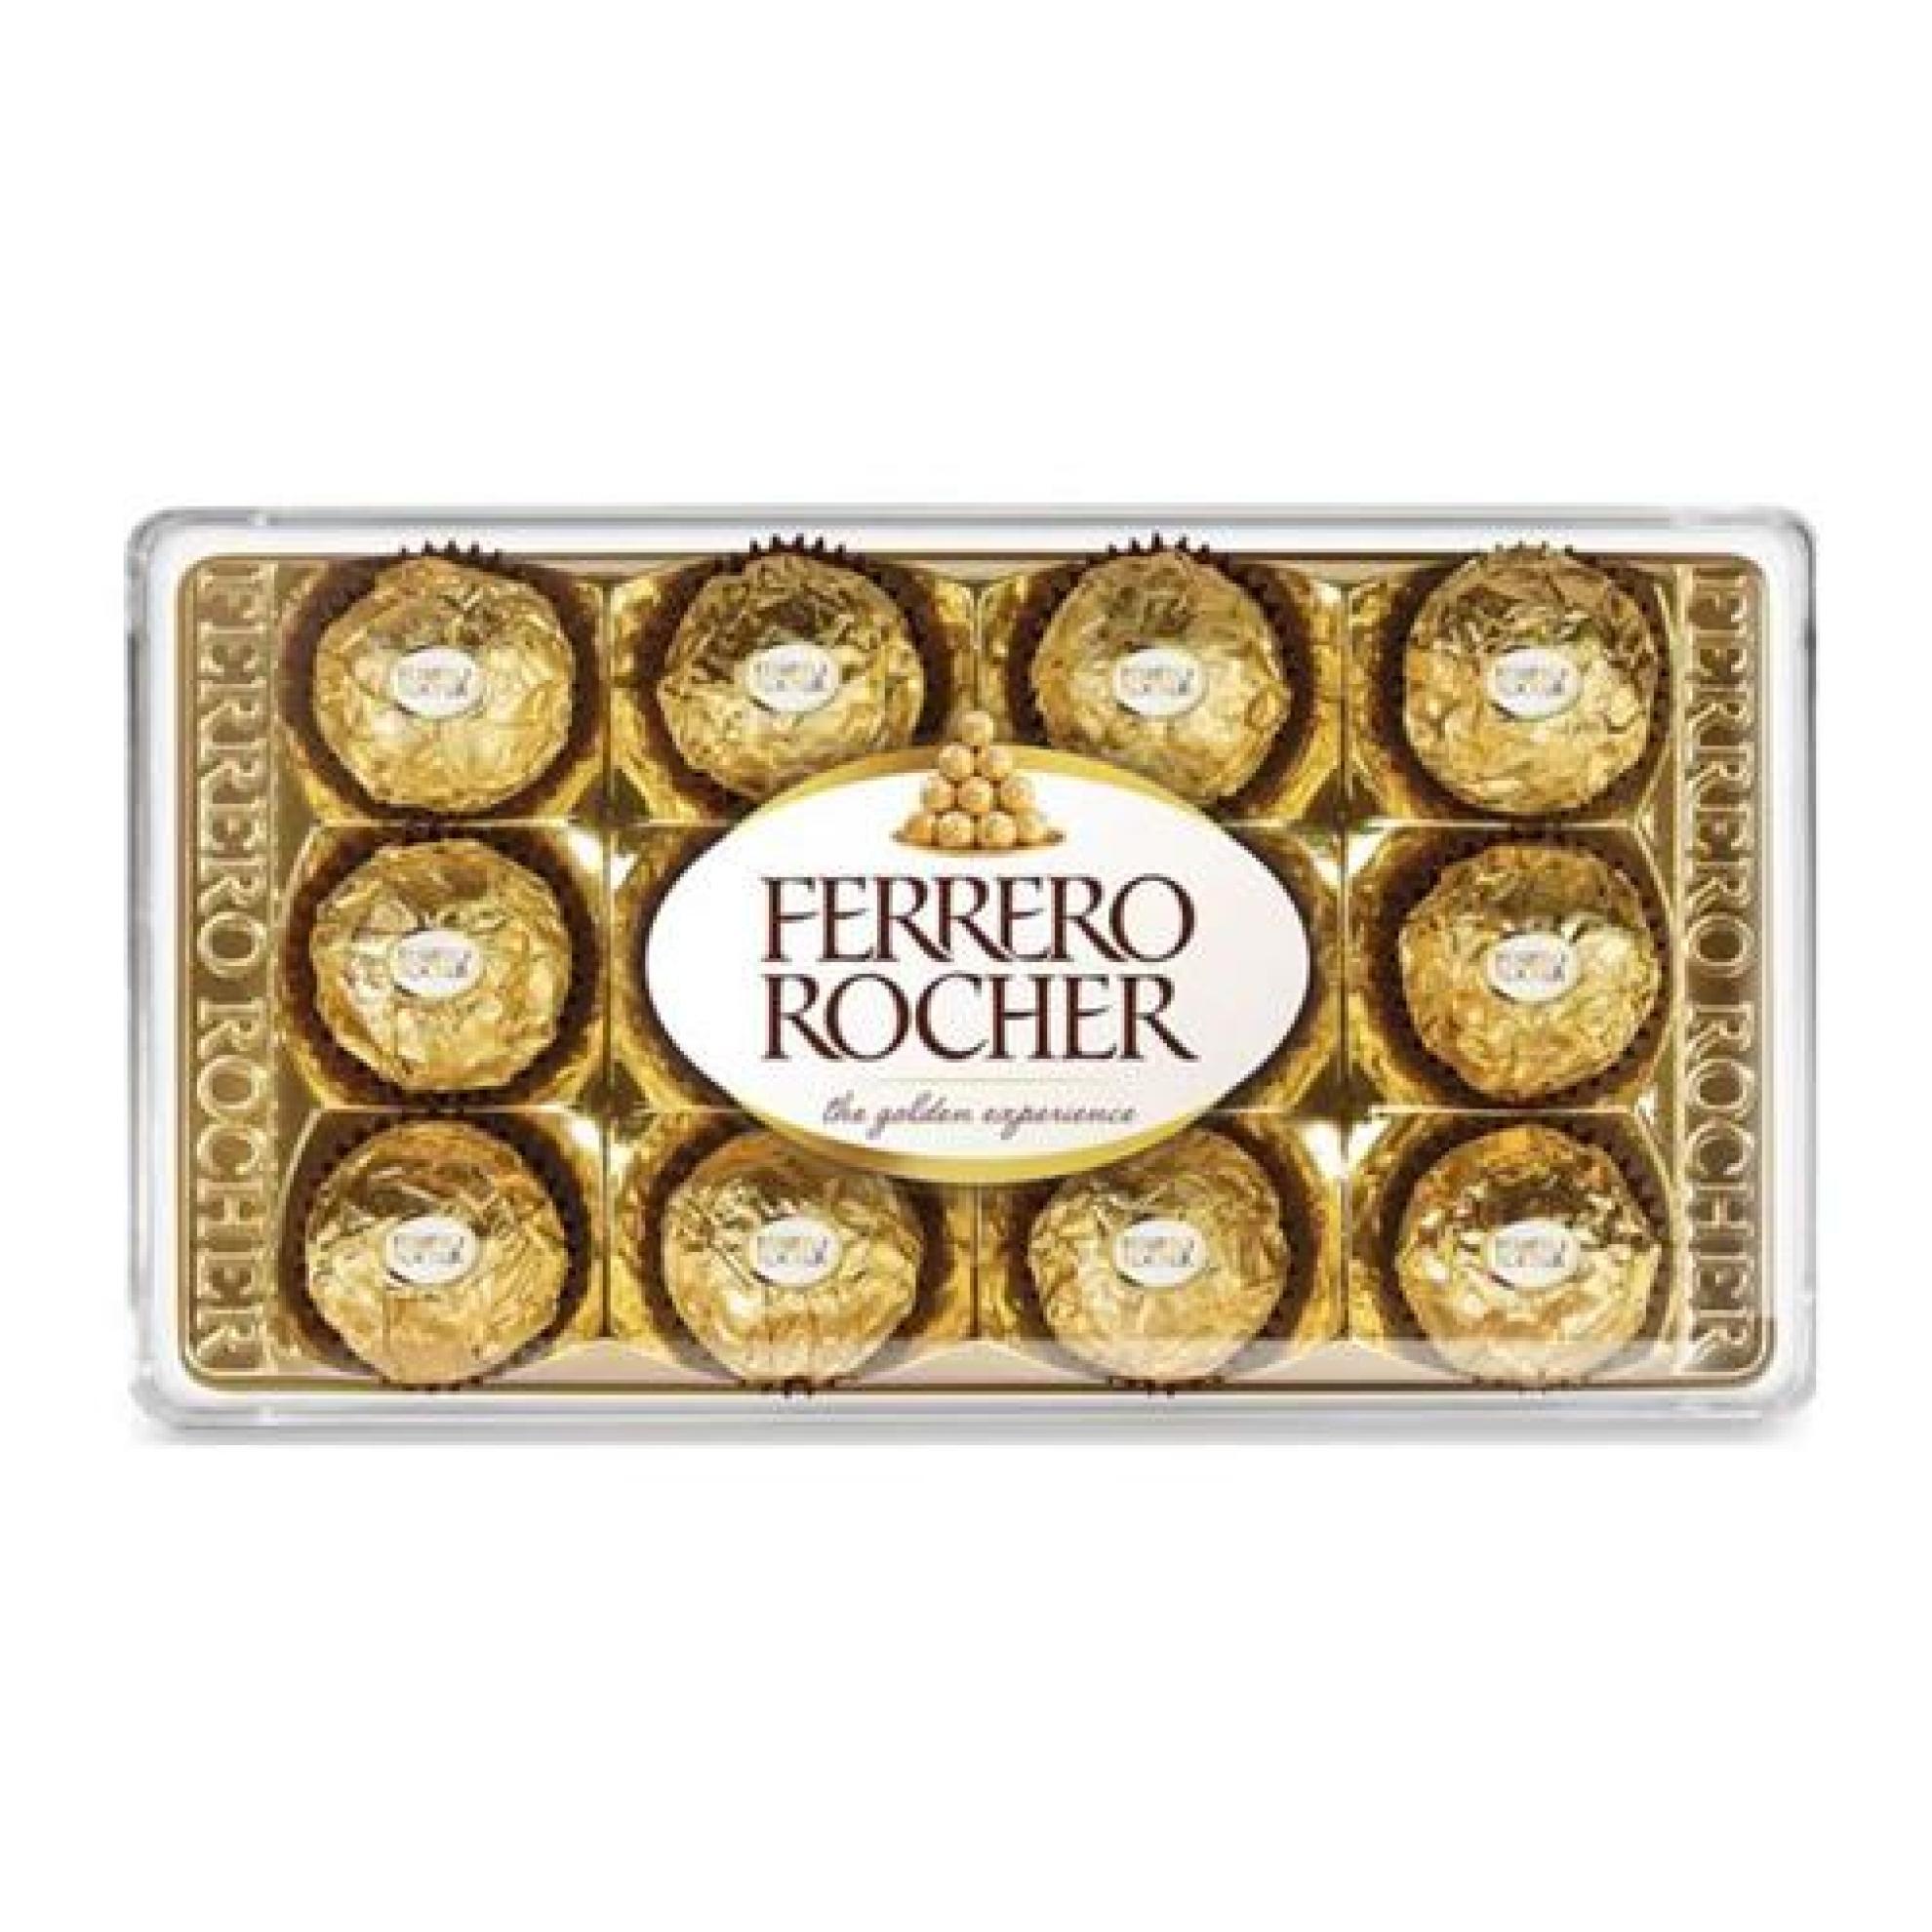 Bombom Ferrero Rocher - 1031